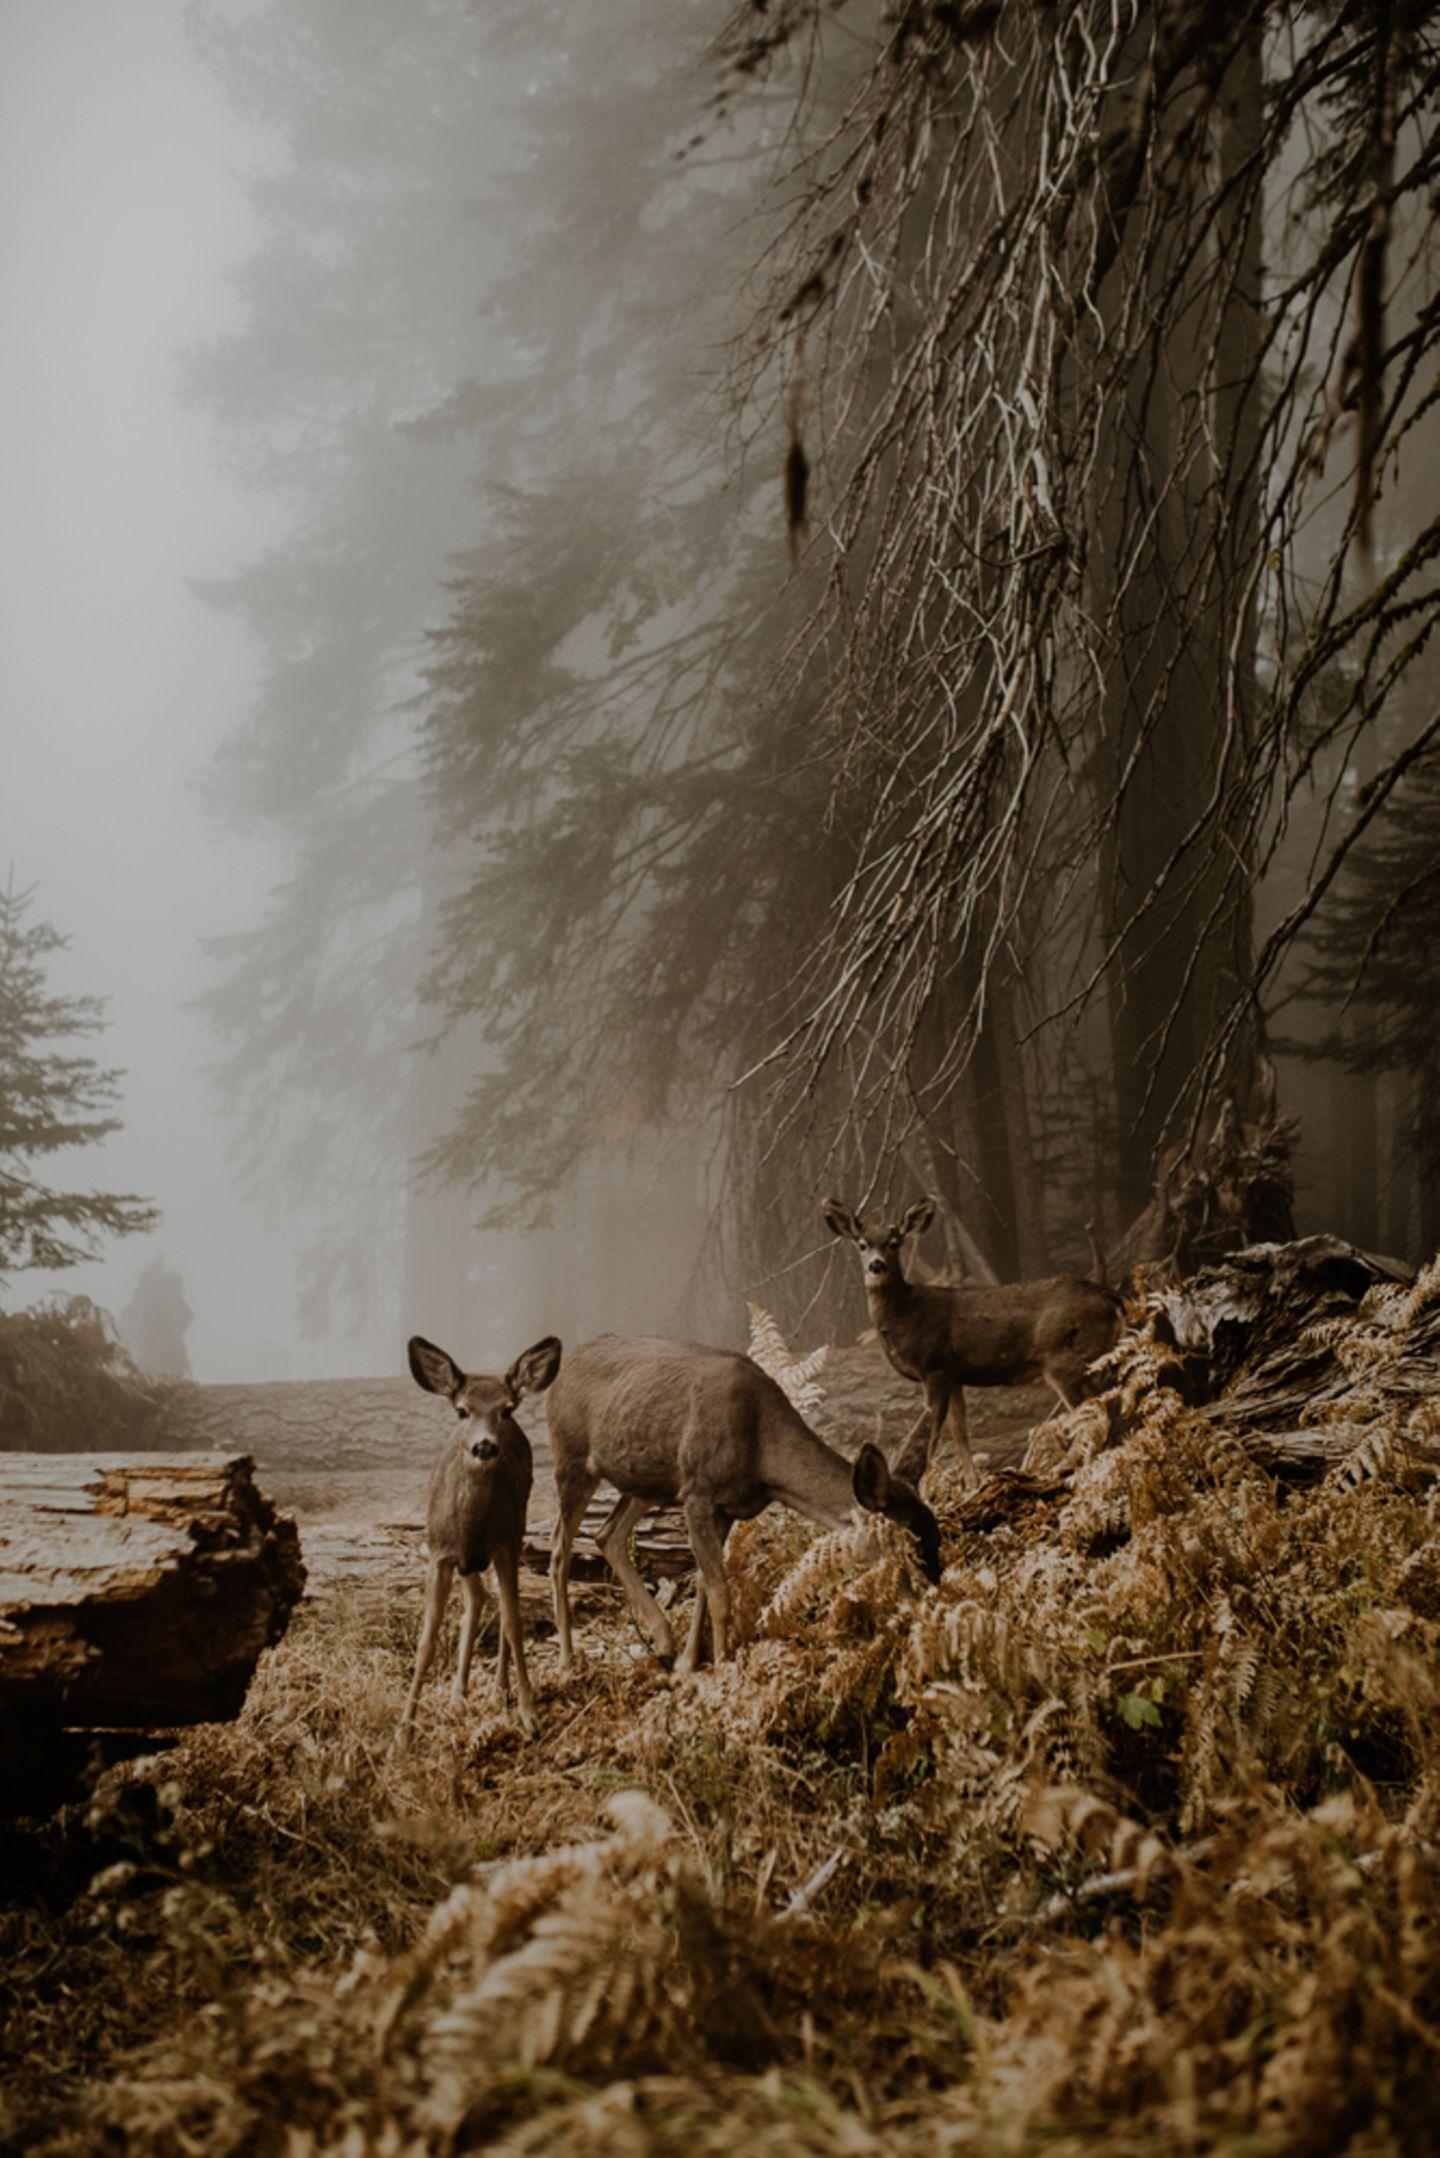 Justyna Zdunczyk, Poland, Winner, Open Wildlife and Winner, Poland National Award, 2018 Sony World Photography Awards